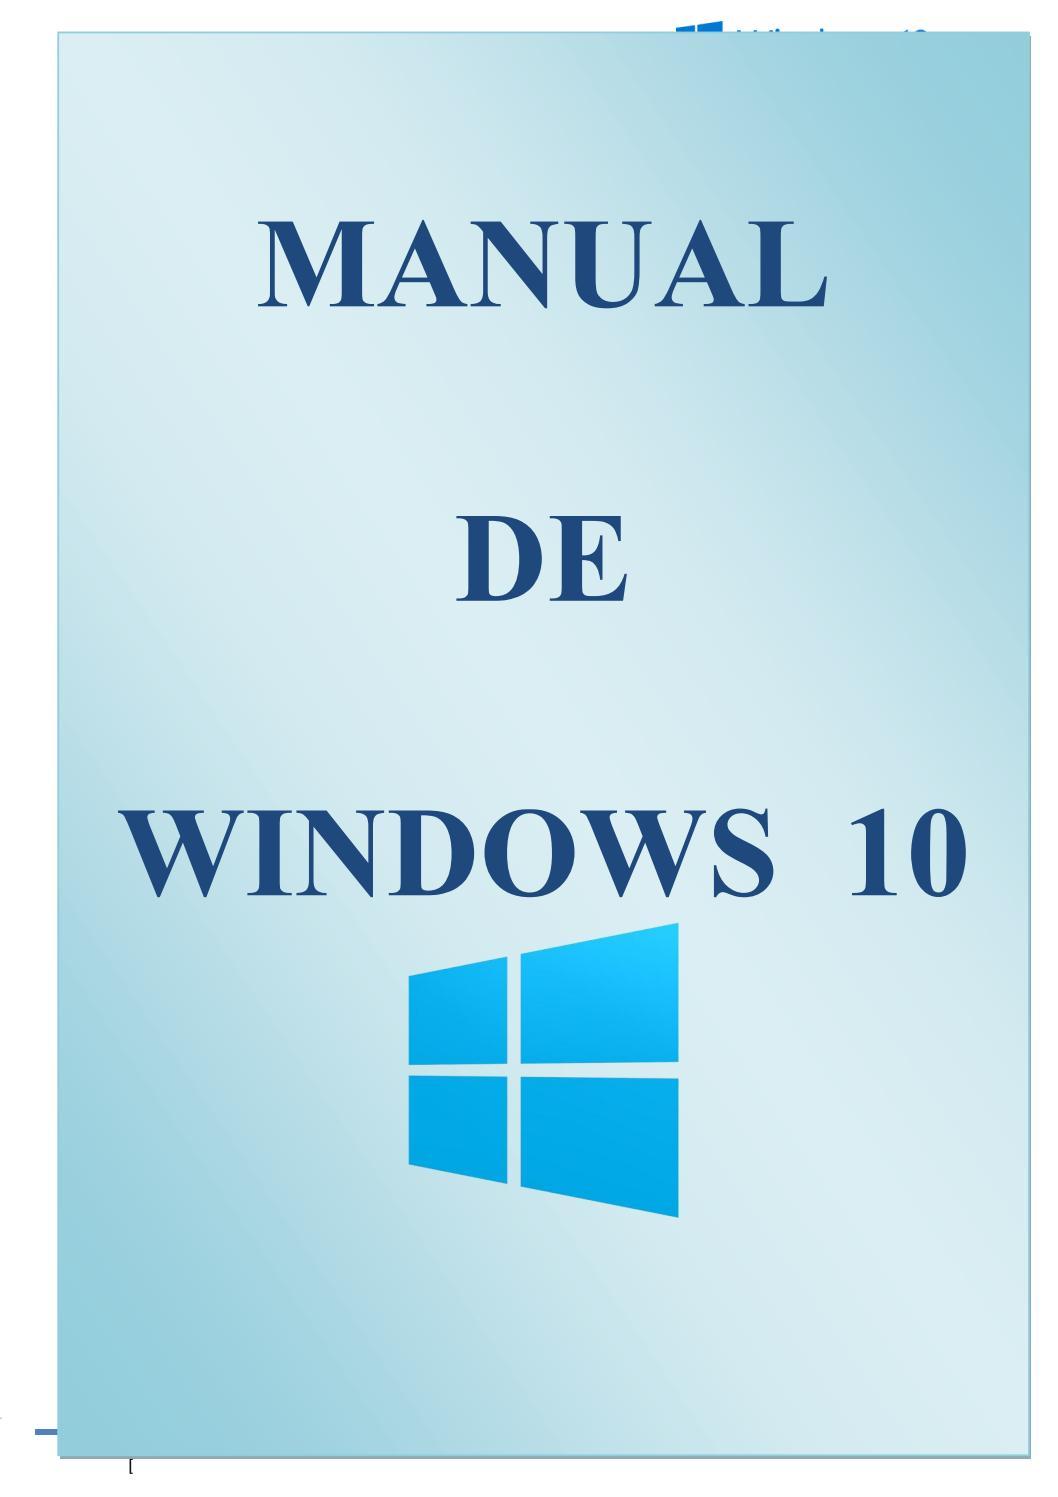 manual libreoffice 5.1 español pdf